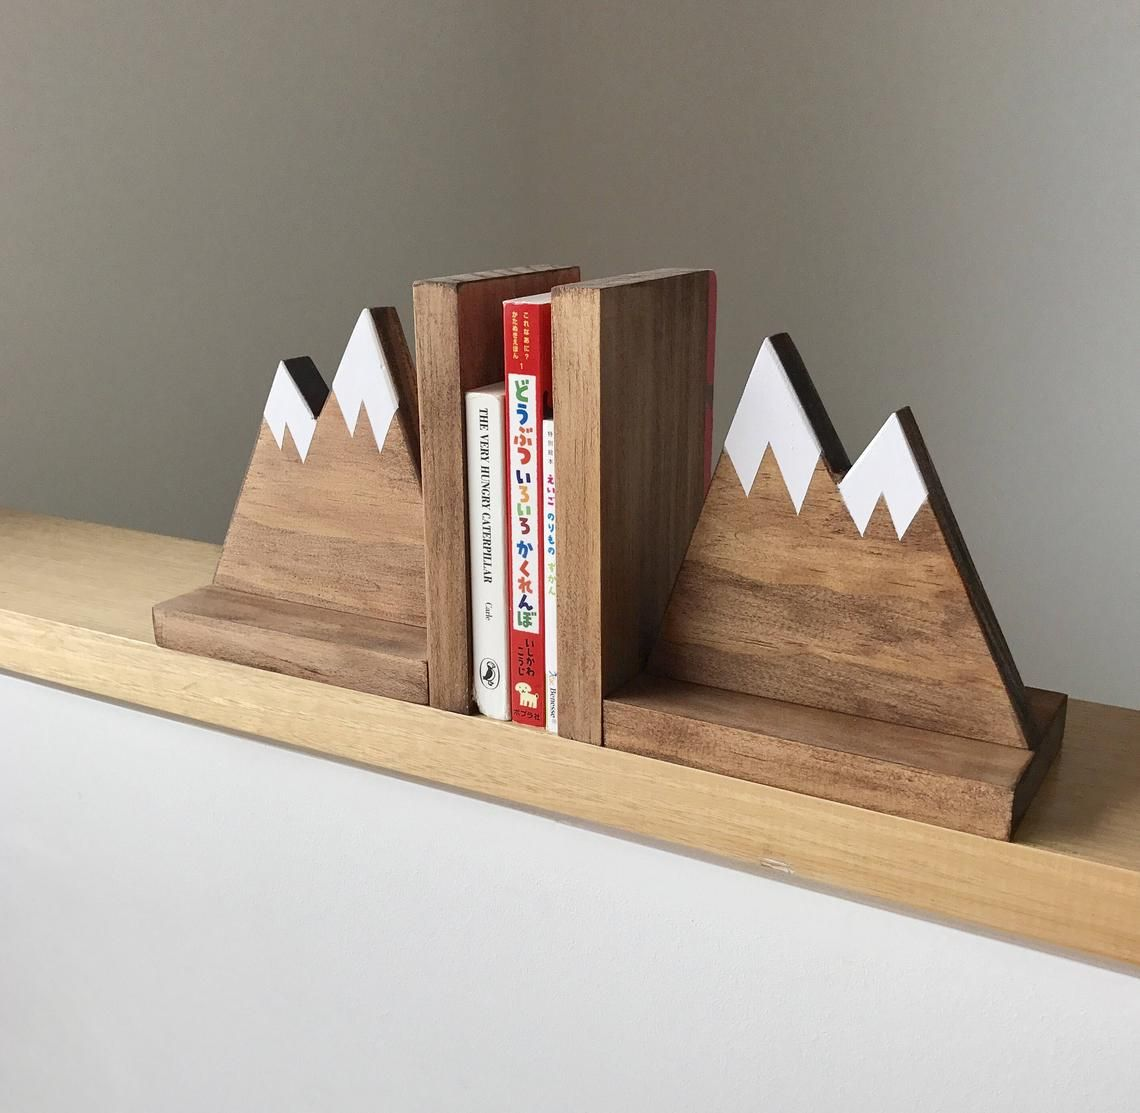 Home Design Ideas Buch: Mountain Peak Book Enden, Woodland Nursery Decor, Stained